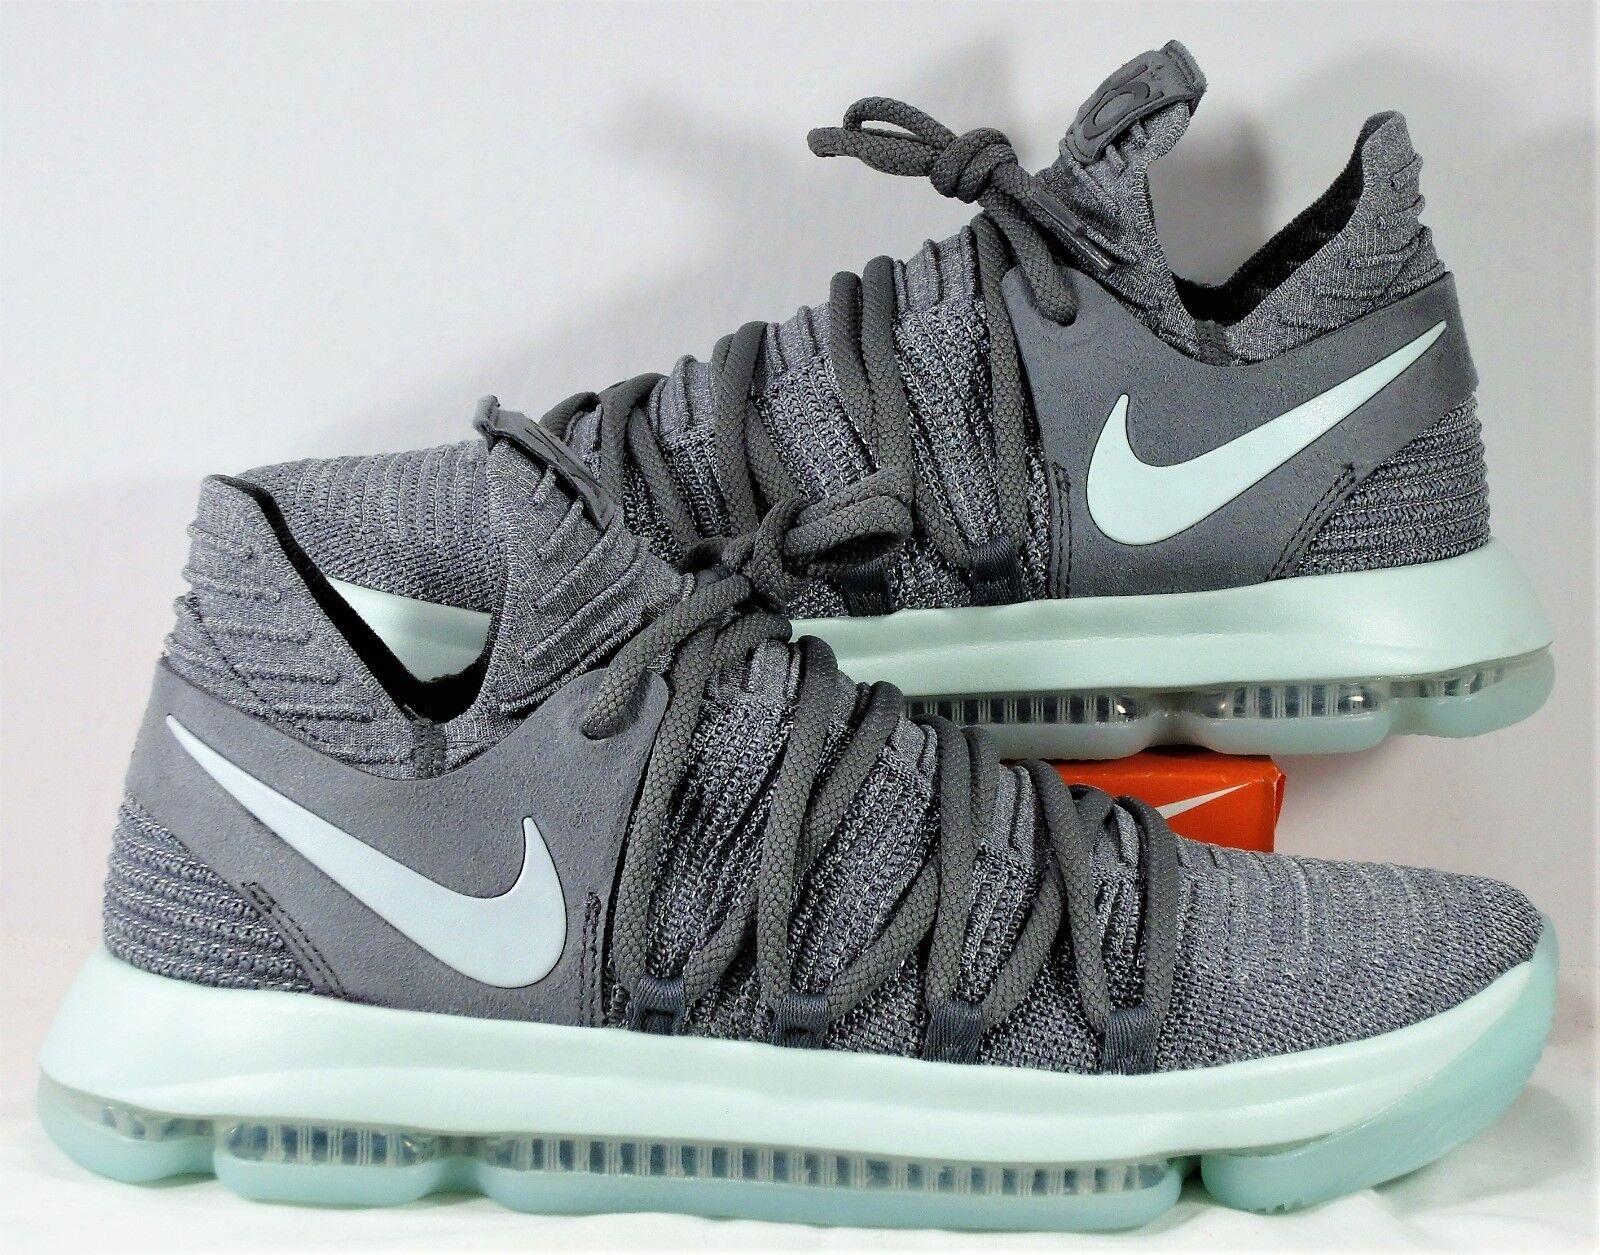 Nike Zoom KD 10 X Kevin Durant Durant Durant Cool Grey & Igloo & White Sz 17 NEW 897815 002 9aa8e2